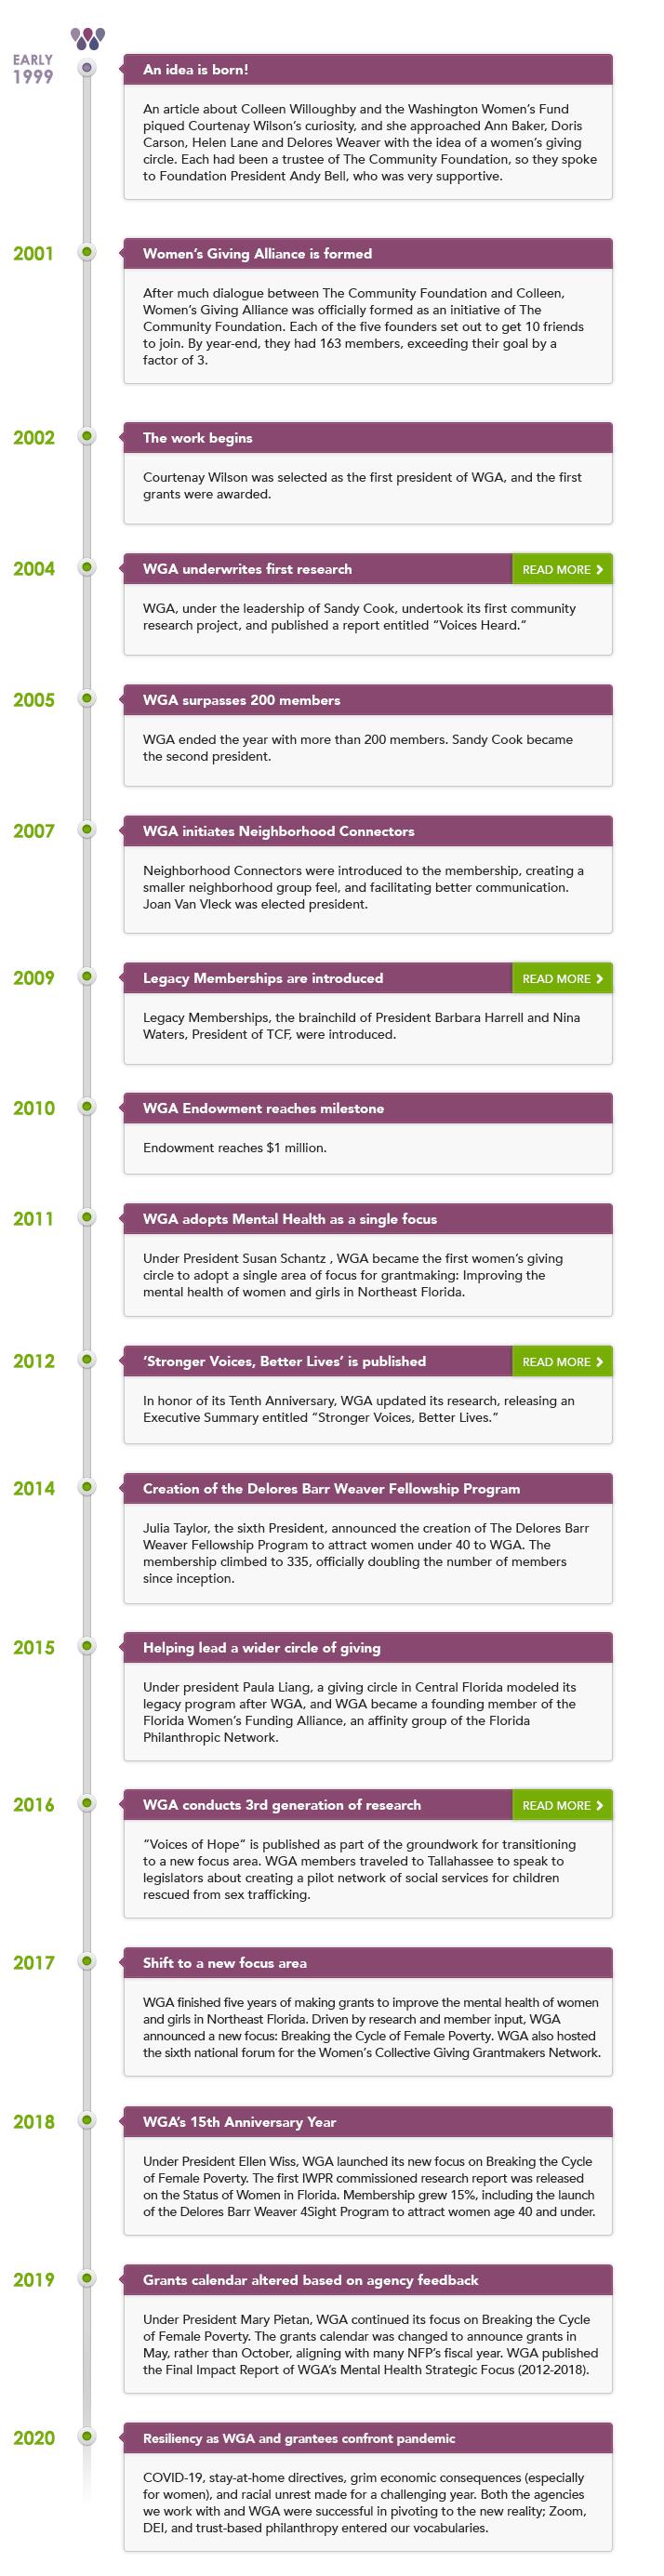 WGA timeline